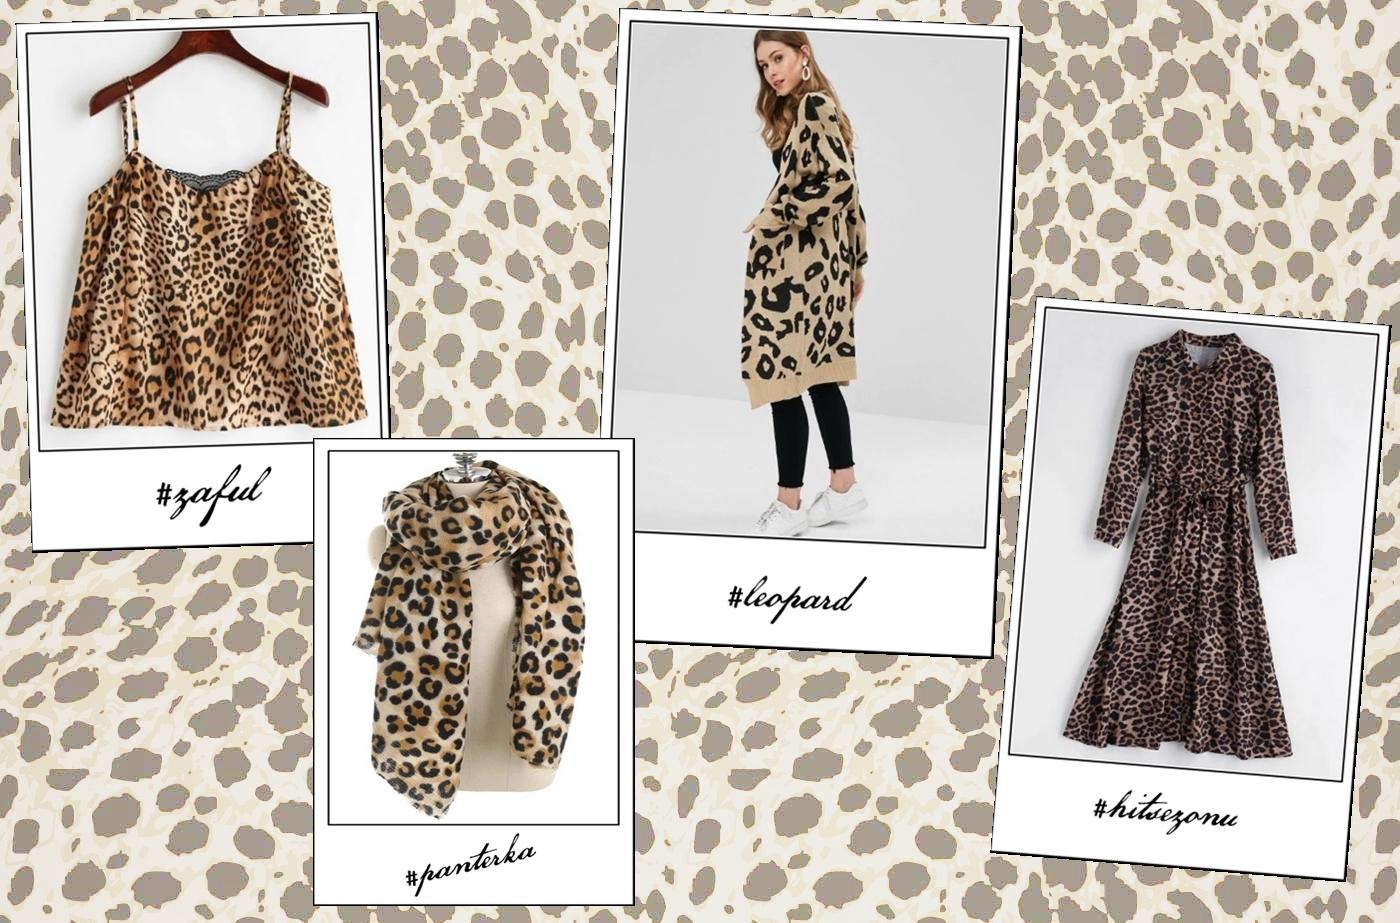 free-vector-leopard-print-background.jpg